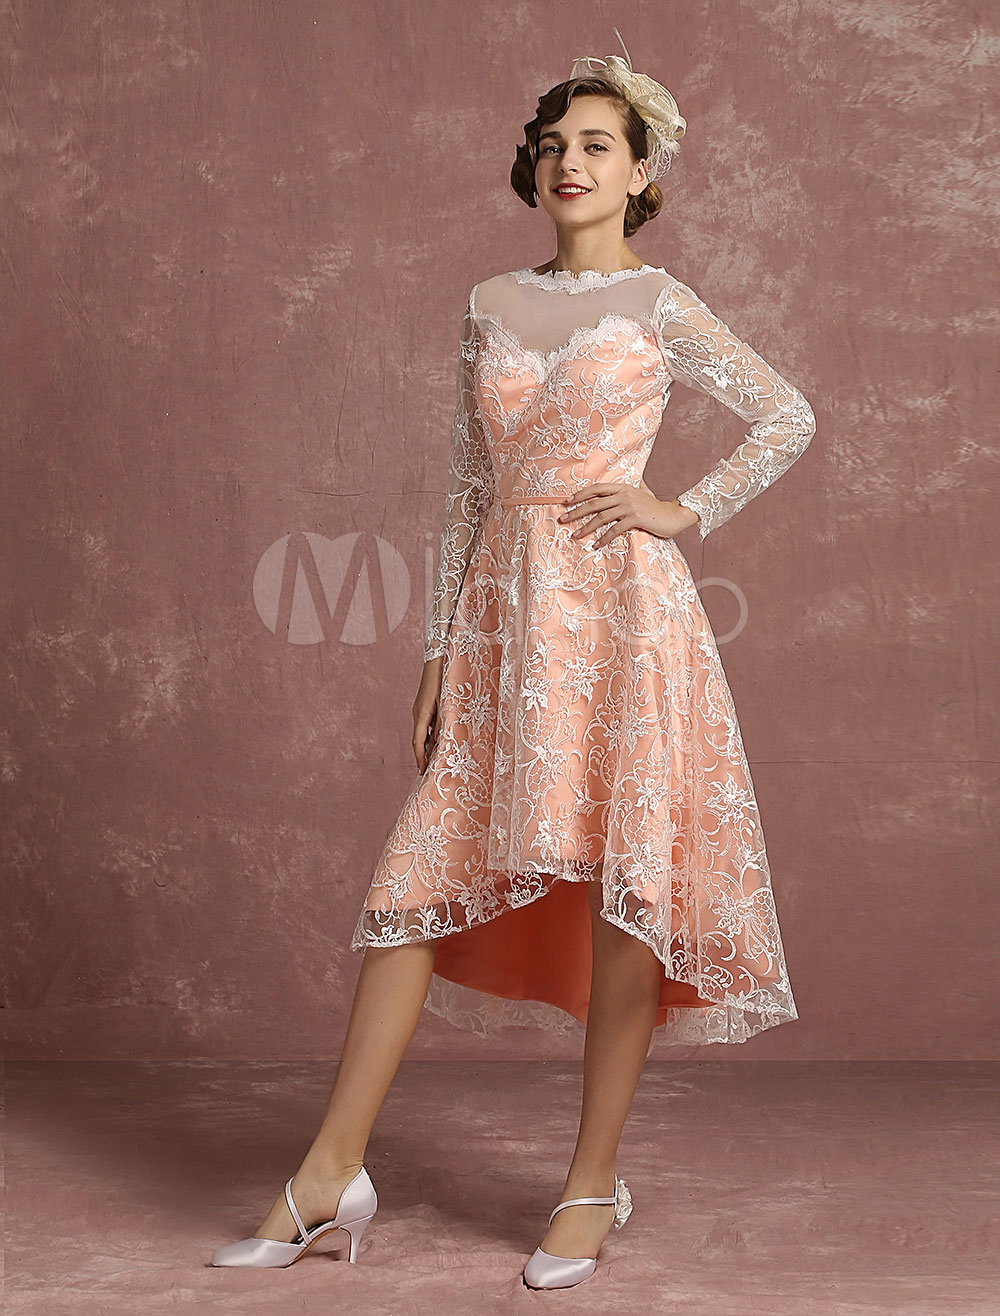 Lace Wedding Dress Pink High Low Vintage Bridal Gown Illusion Long Sleeve A Line V Back Short Bridal Dress Milanoo photo